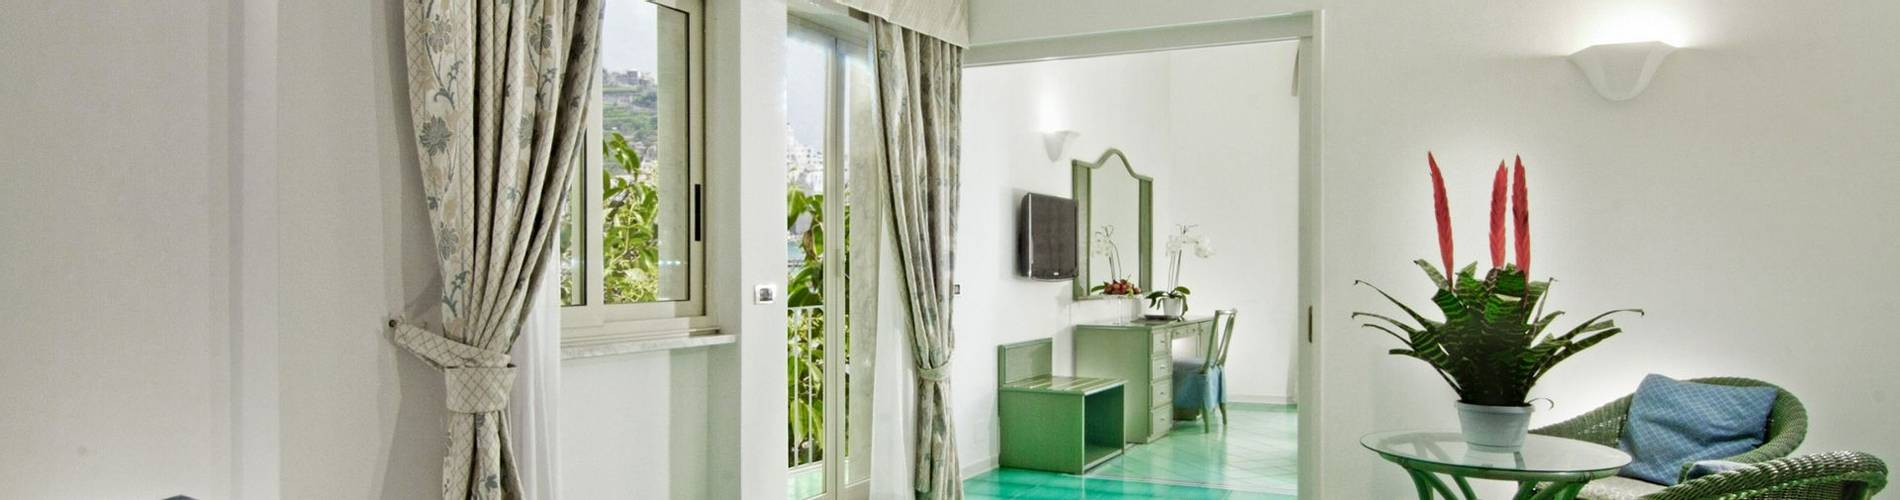 Miramalfi, Amalfi Coast, Italy, Junior Suite.jpg